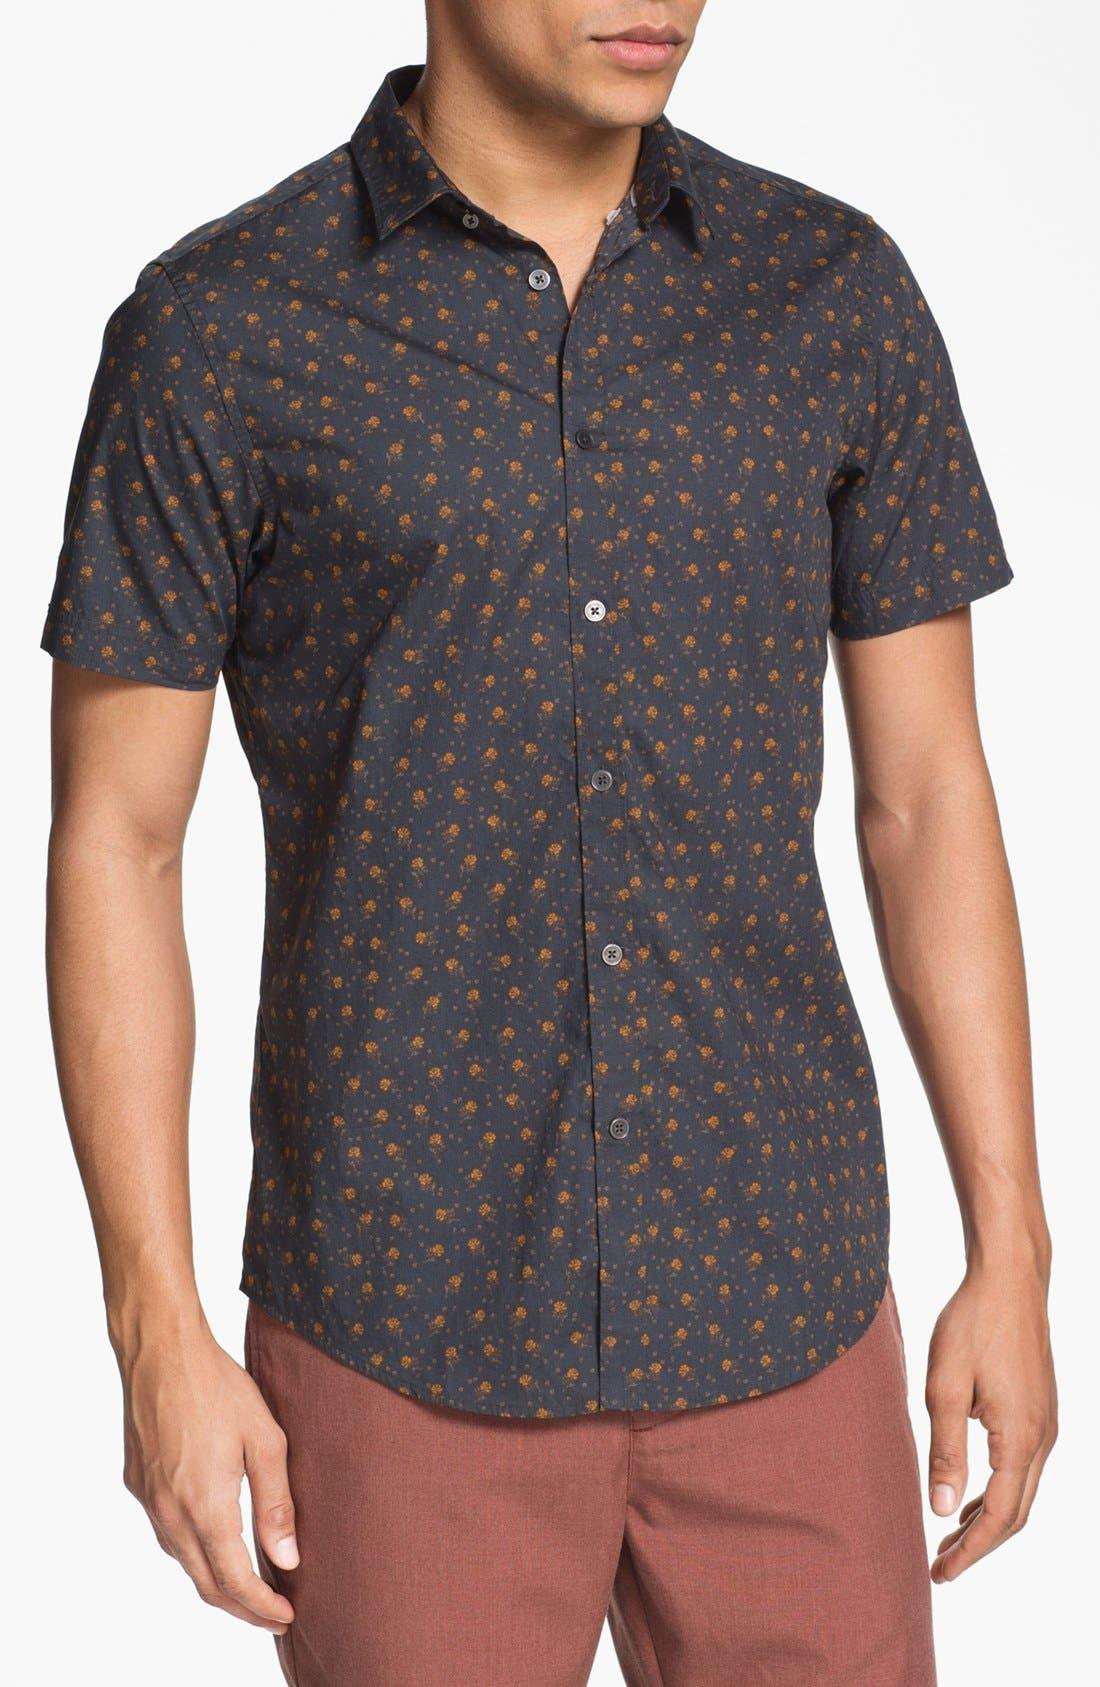 Alternate Image 1 Selected - Ben Sherman Floral Print Woven Shirt